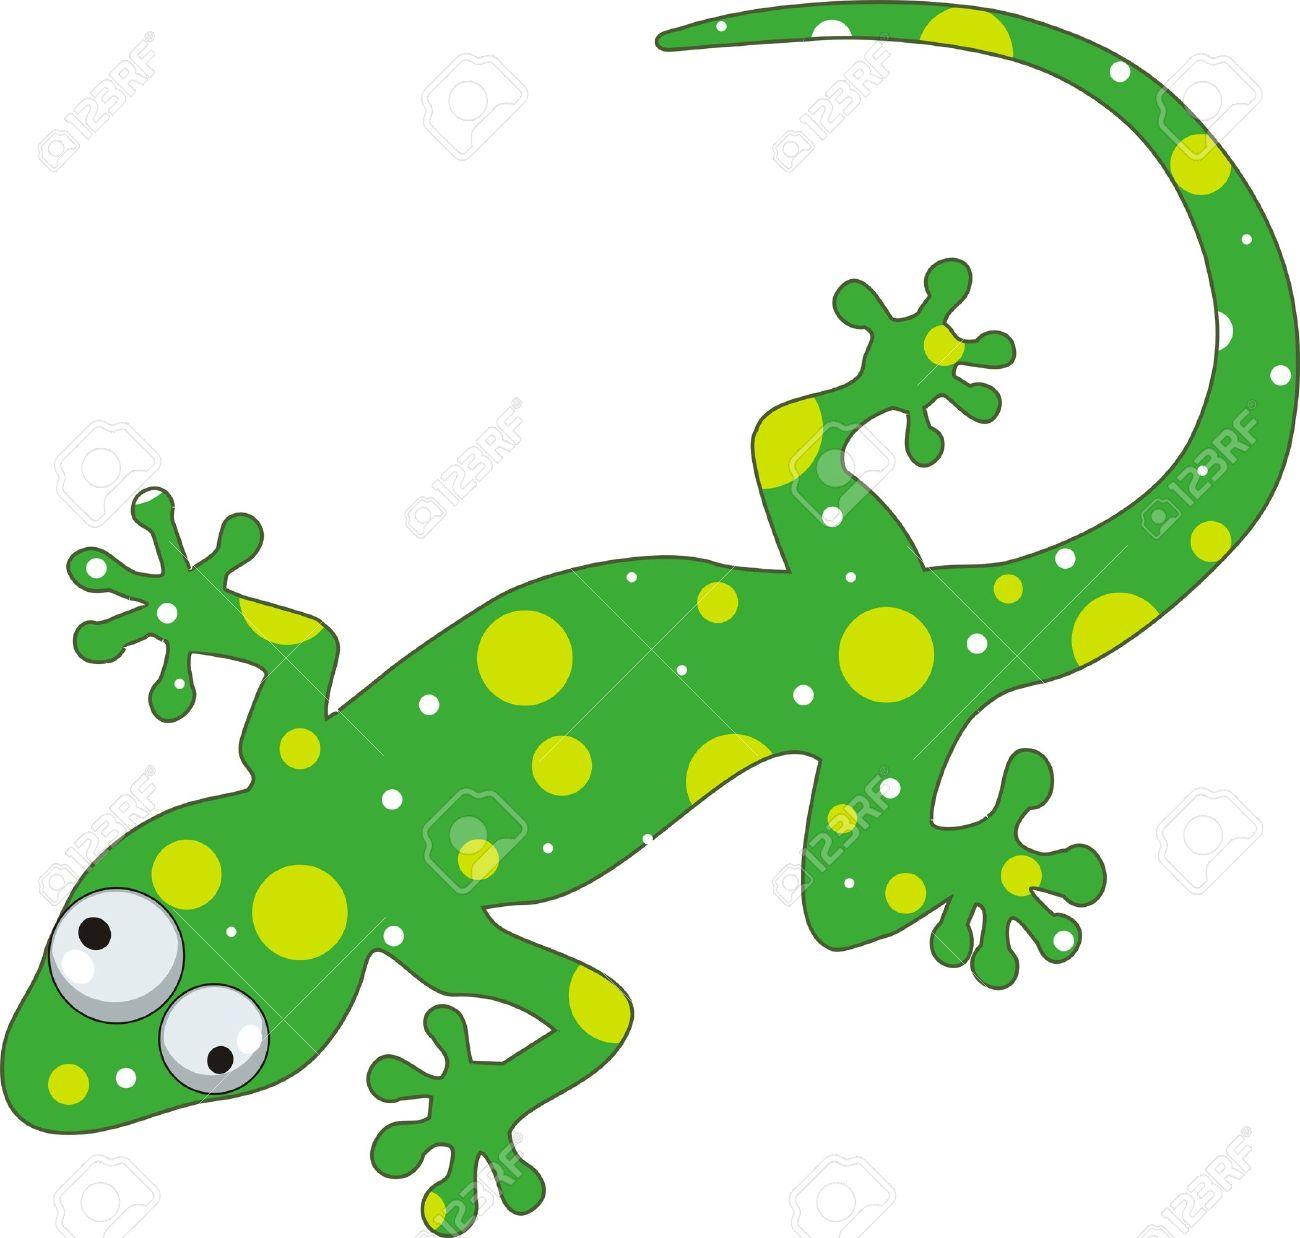 Gecko clipart geko. Free download best on